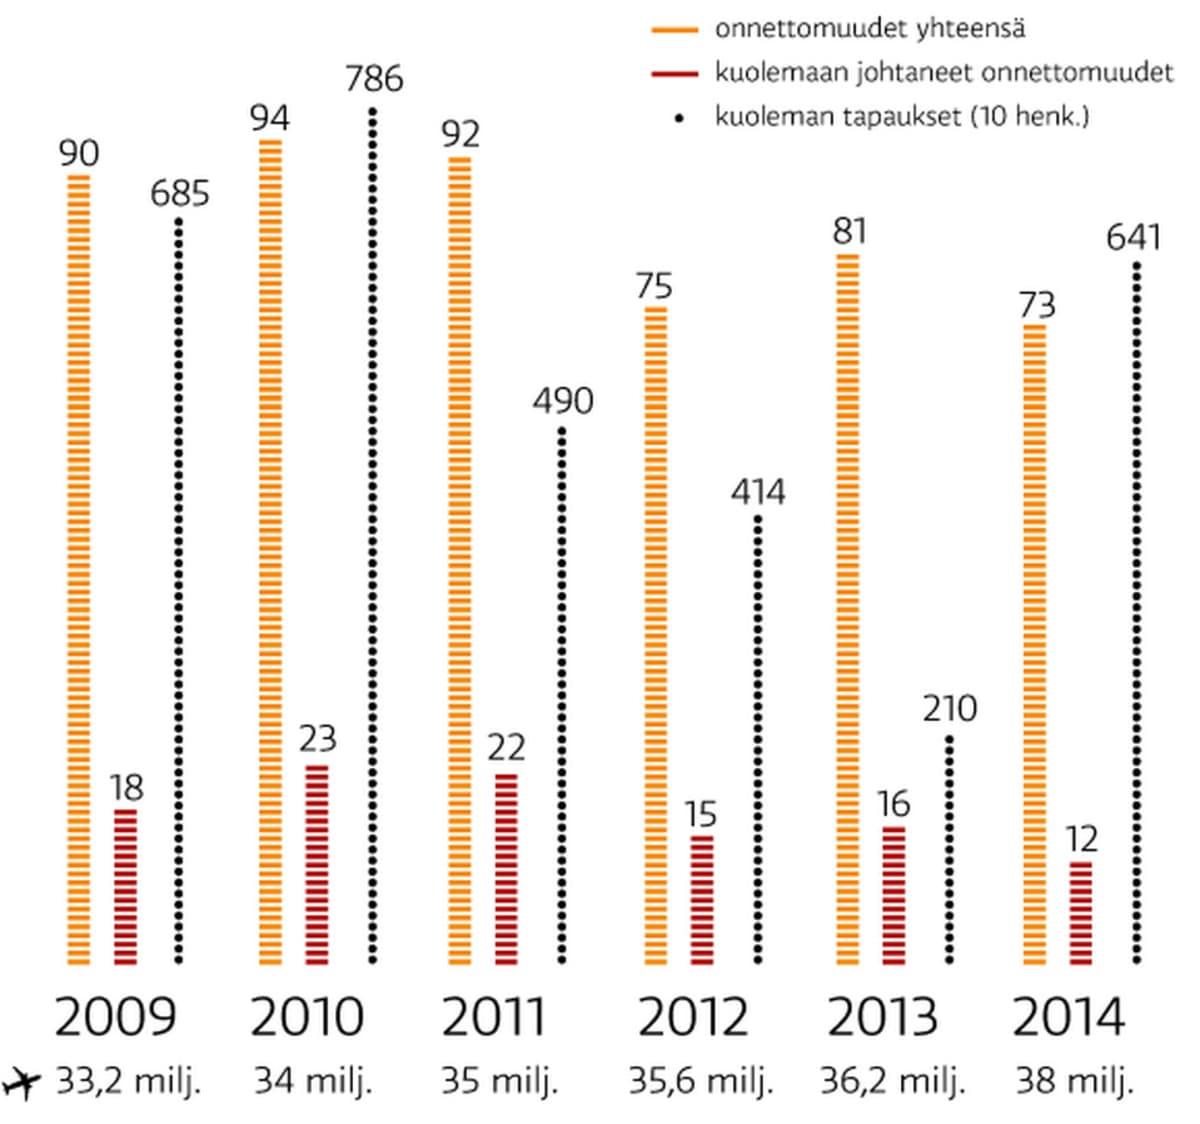 Lento-onnettomuudet 2009-2014